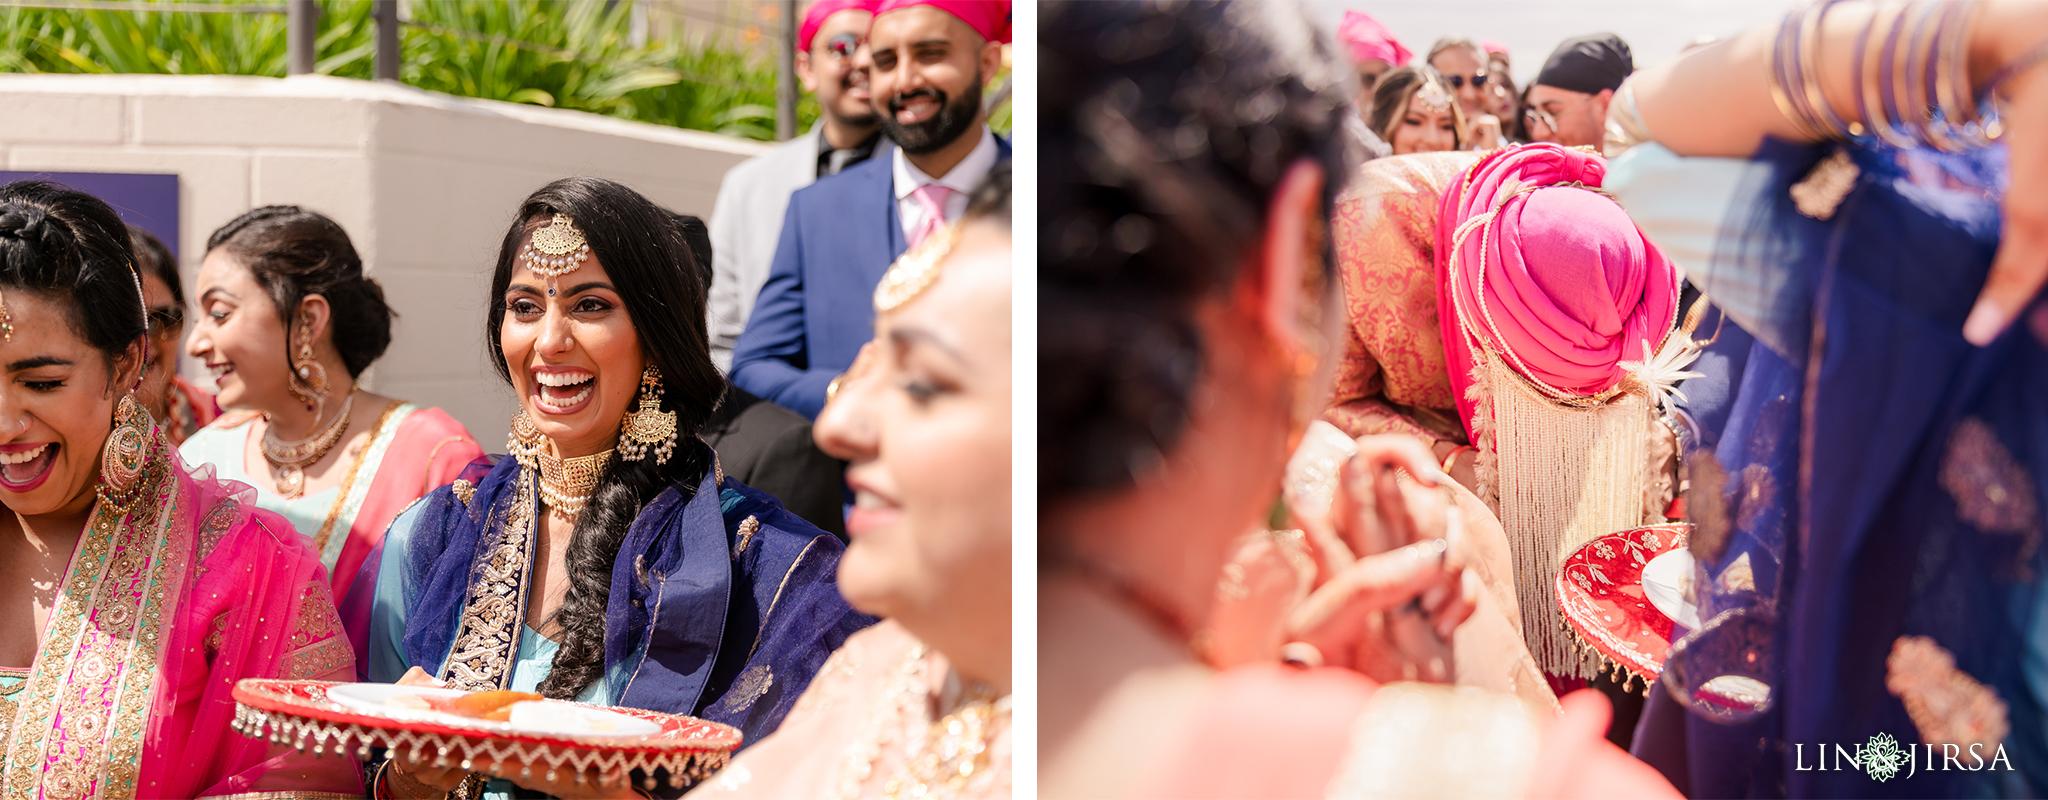 11 Coronado Resort and Spa San Diego Punjabi Wedding Photography